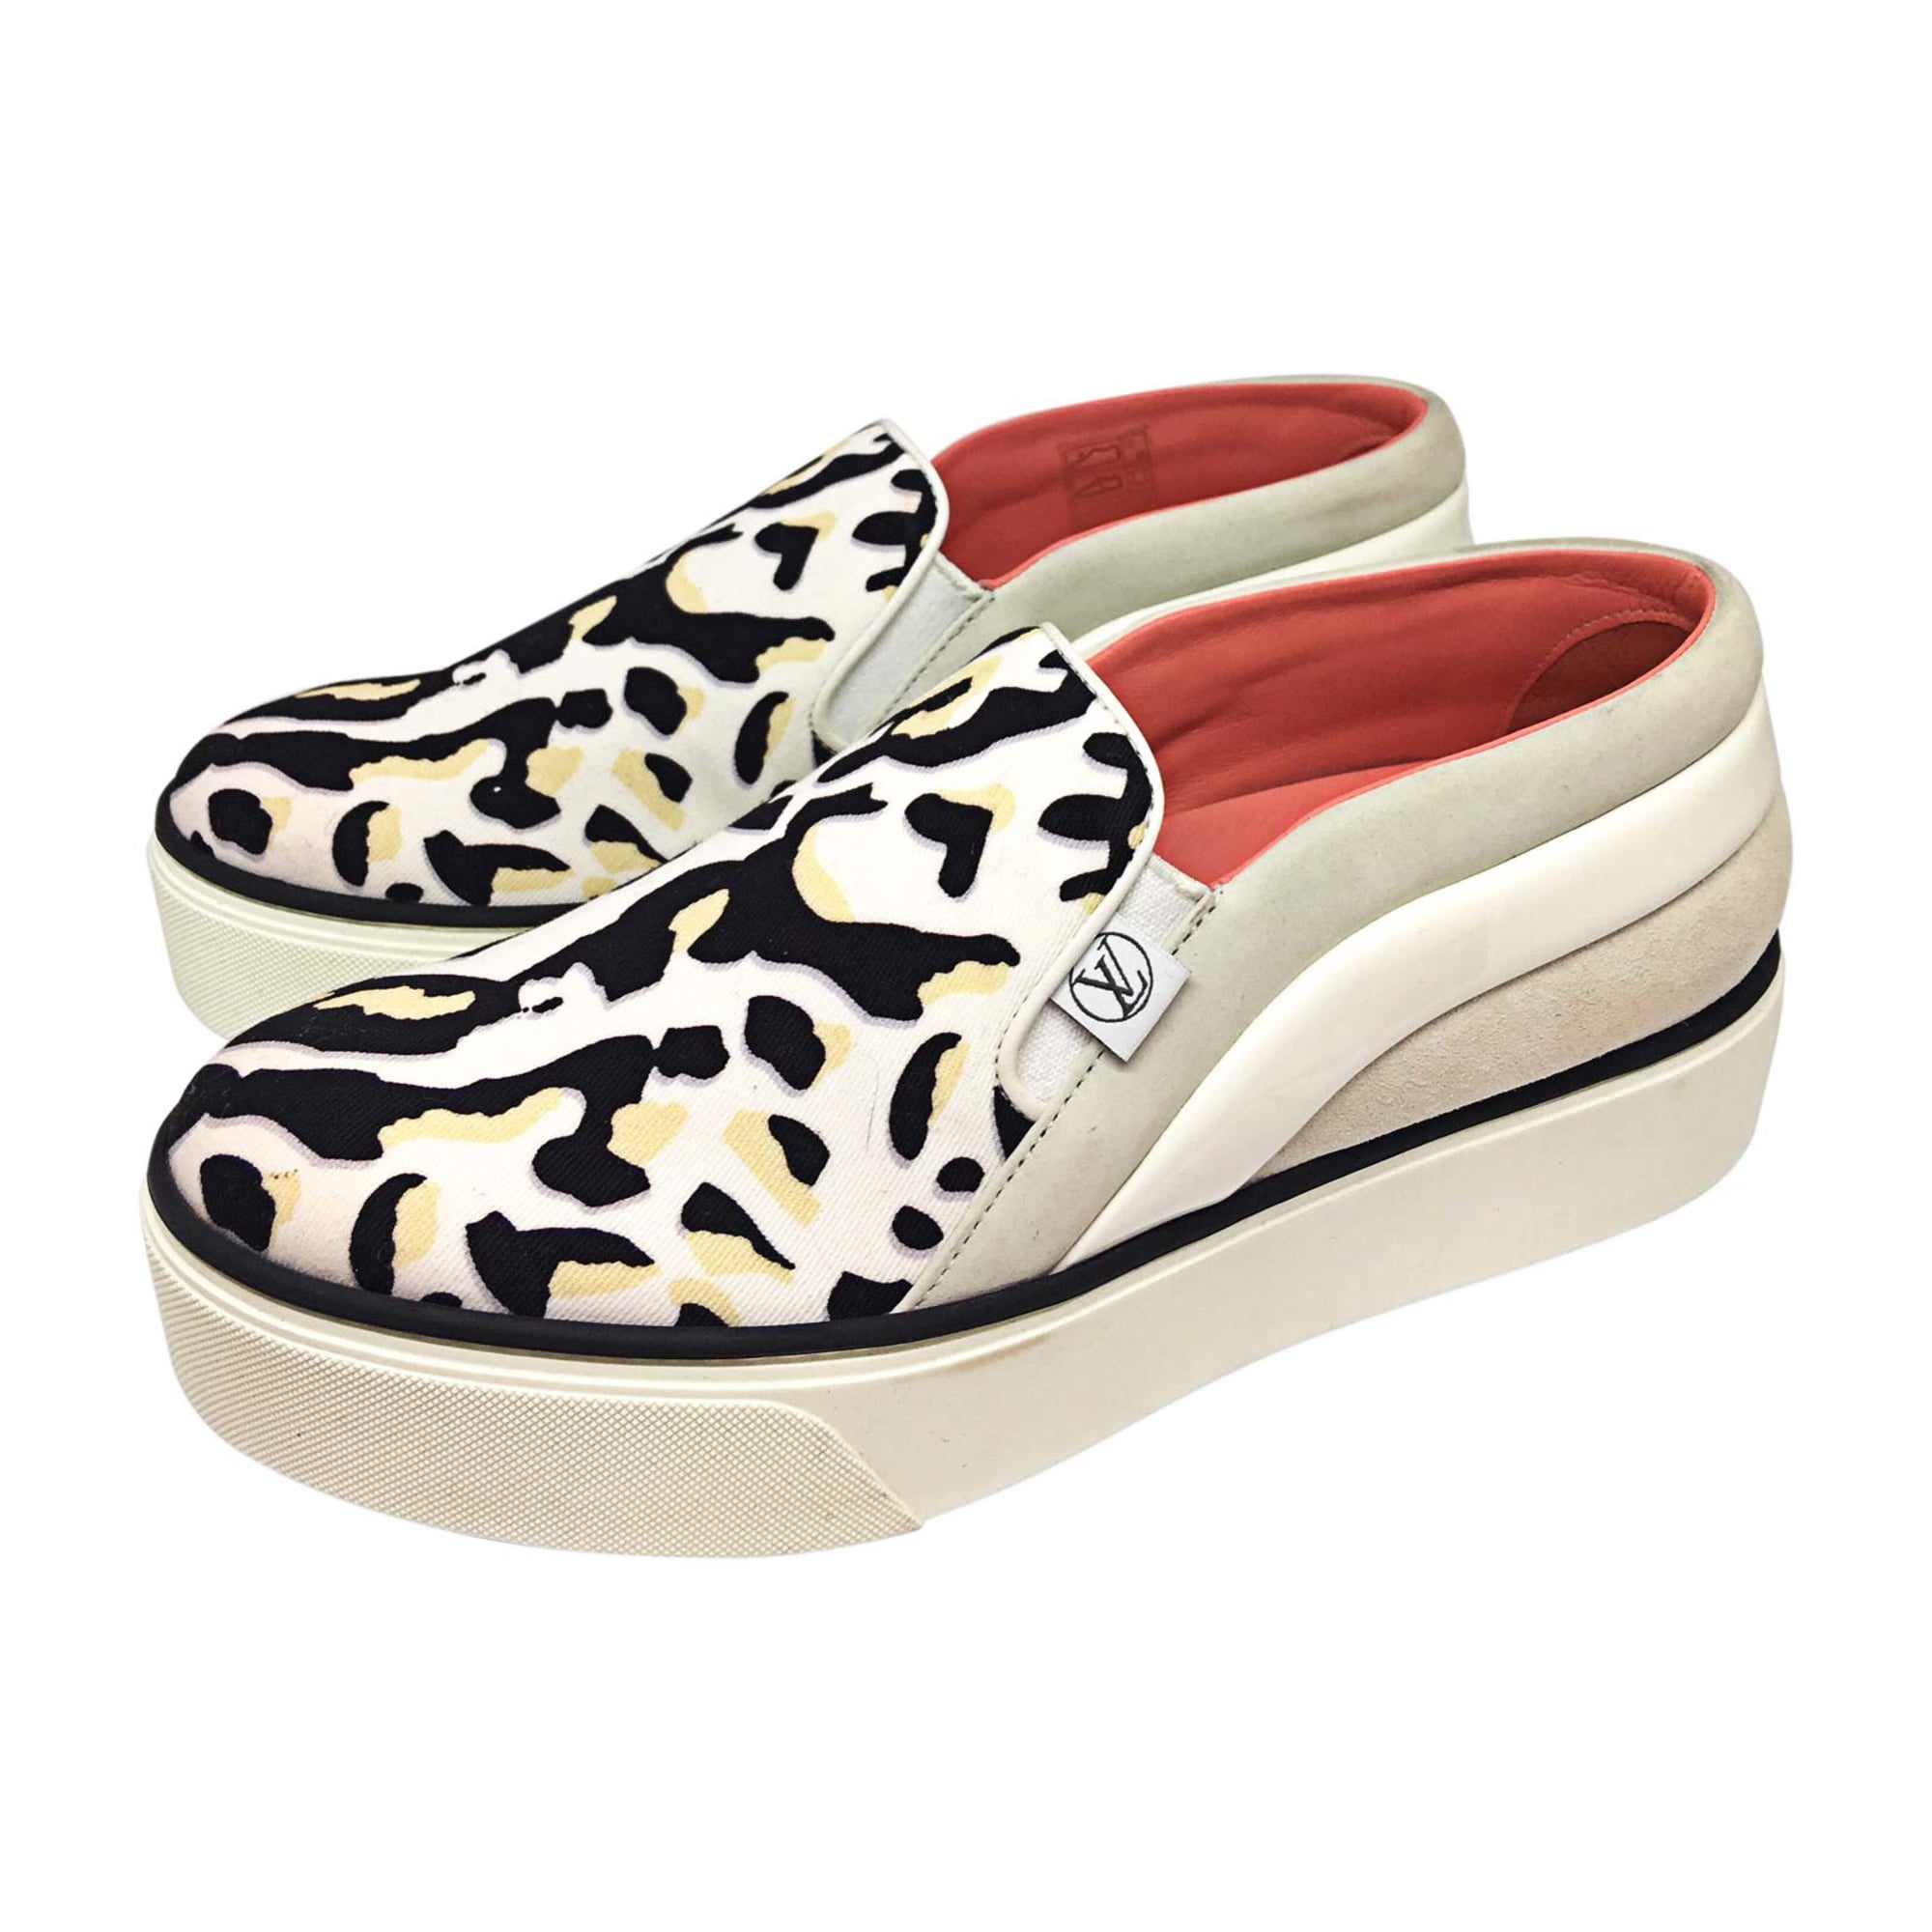 Loafers LOUIS VUITTON White, off-white, ecru